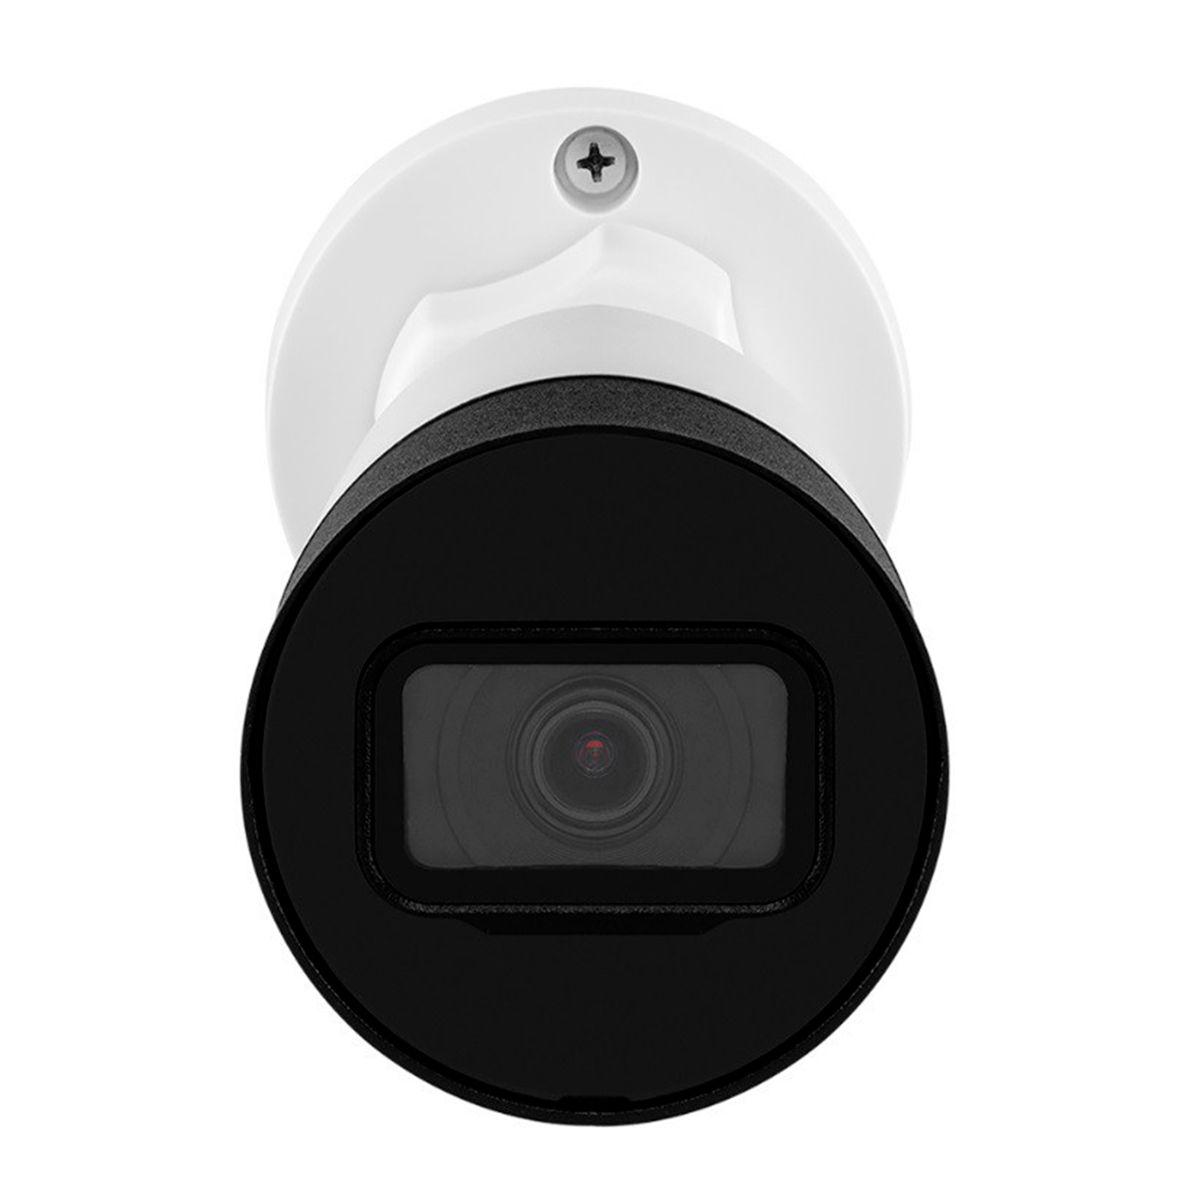 Câmera IP Intelbras VIP 3430 B, 4MP, 2K, PoE, 3,6mm, 30 metros  - Tudo Forte